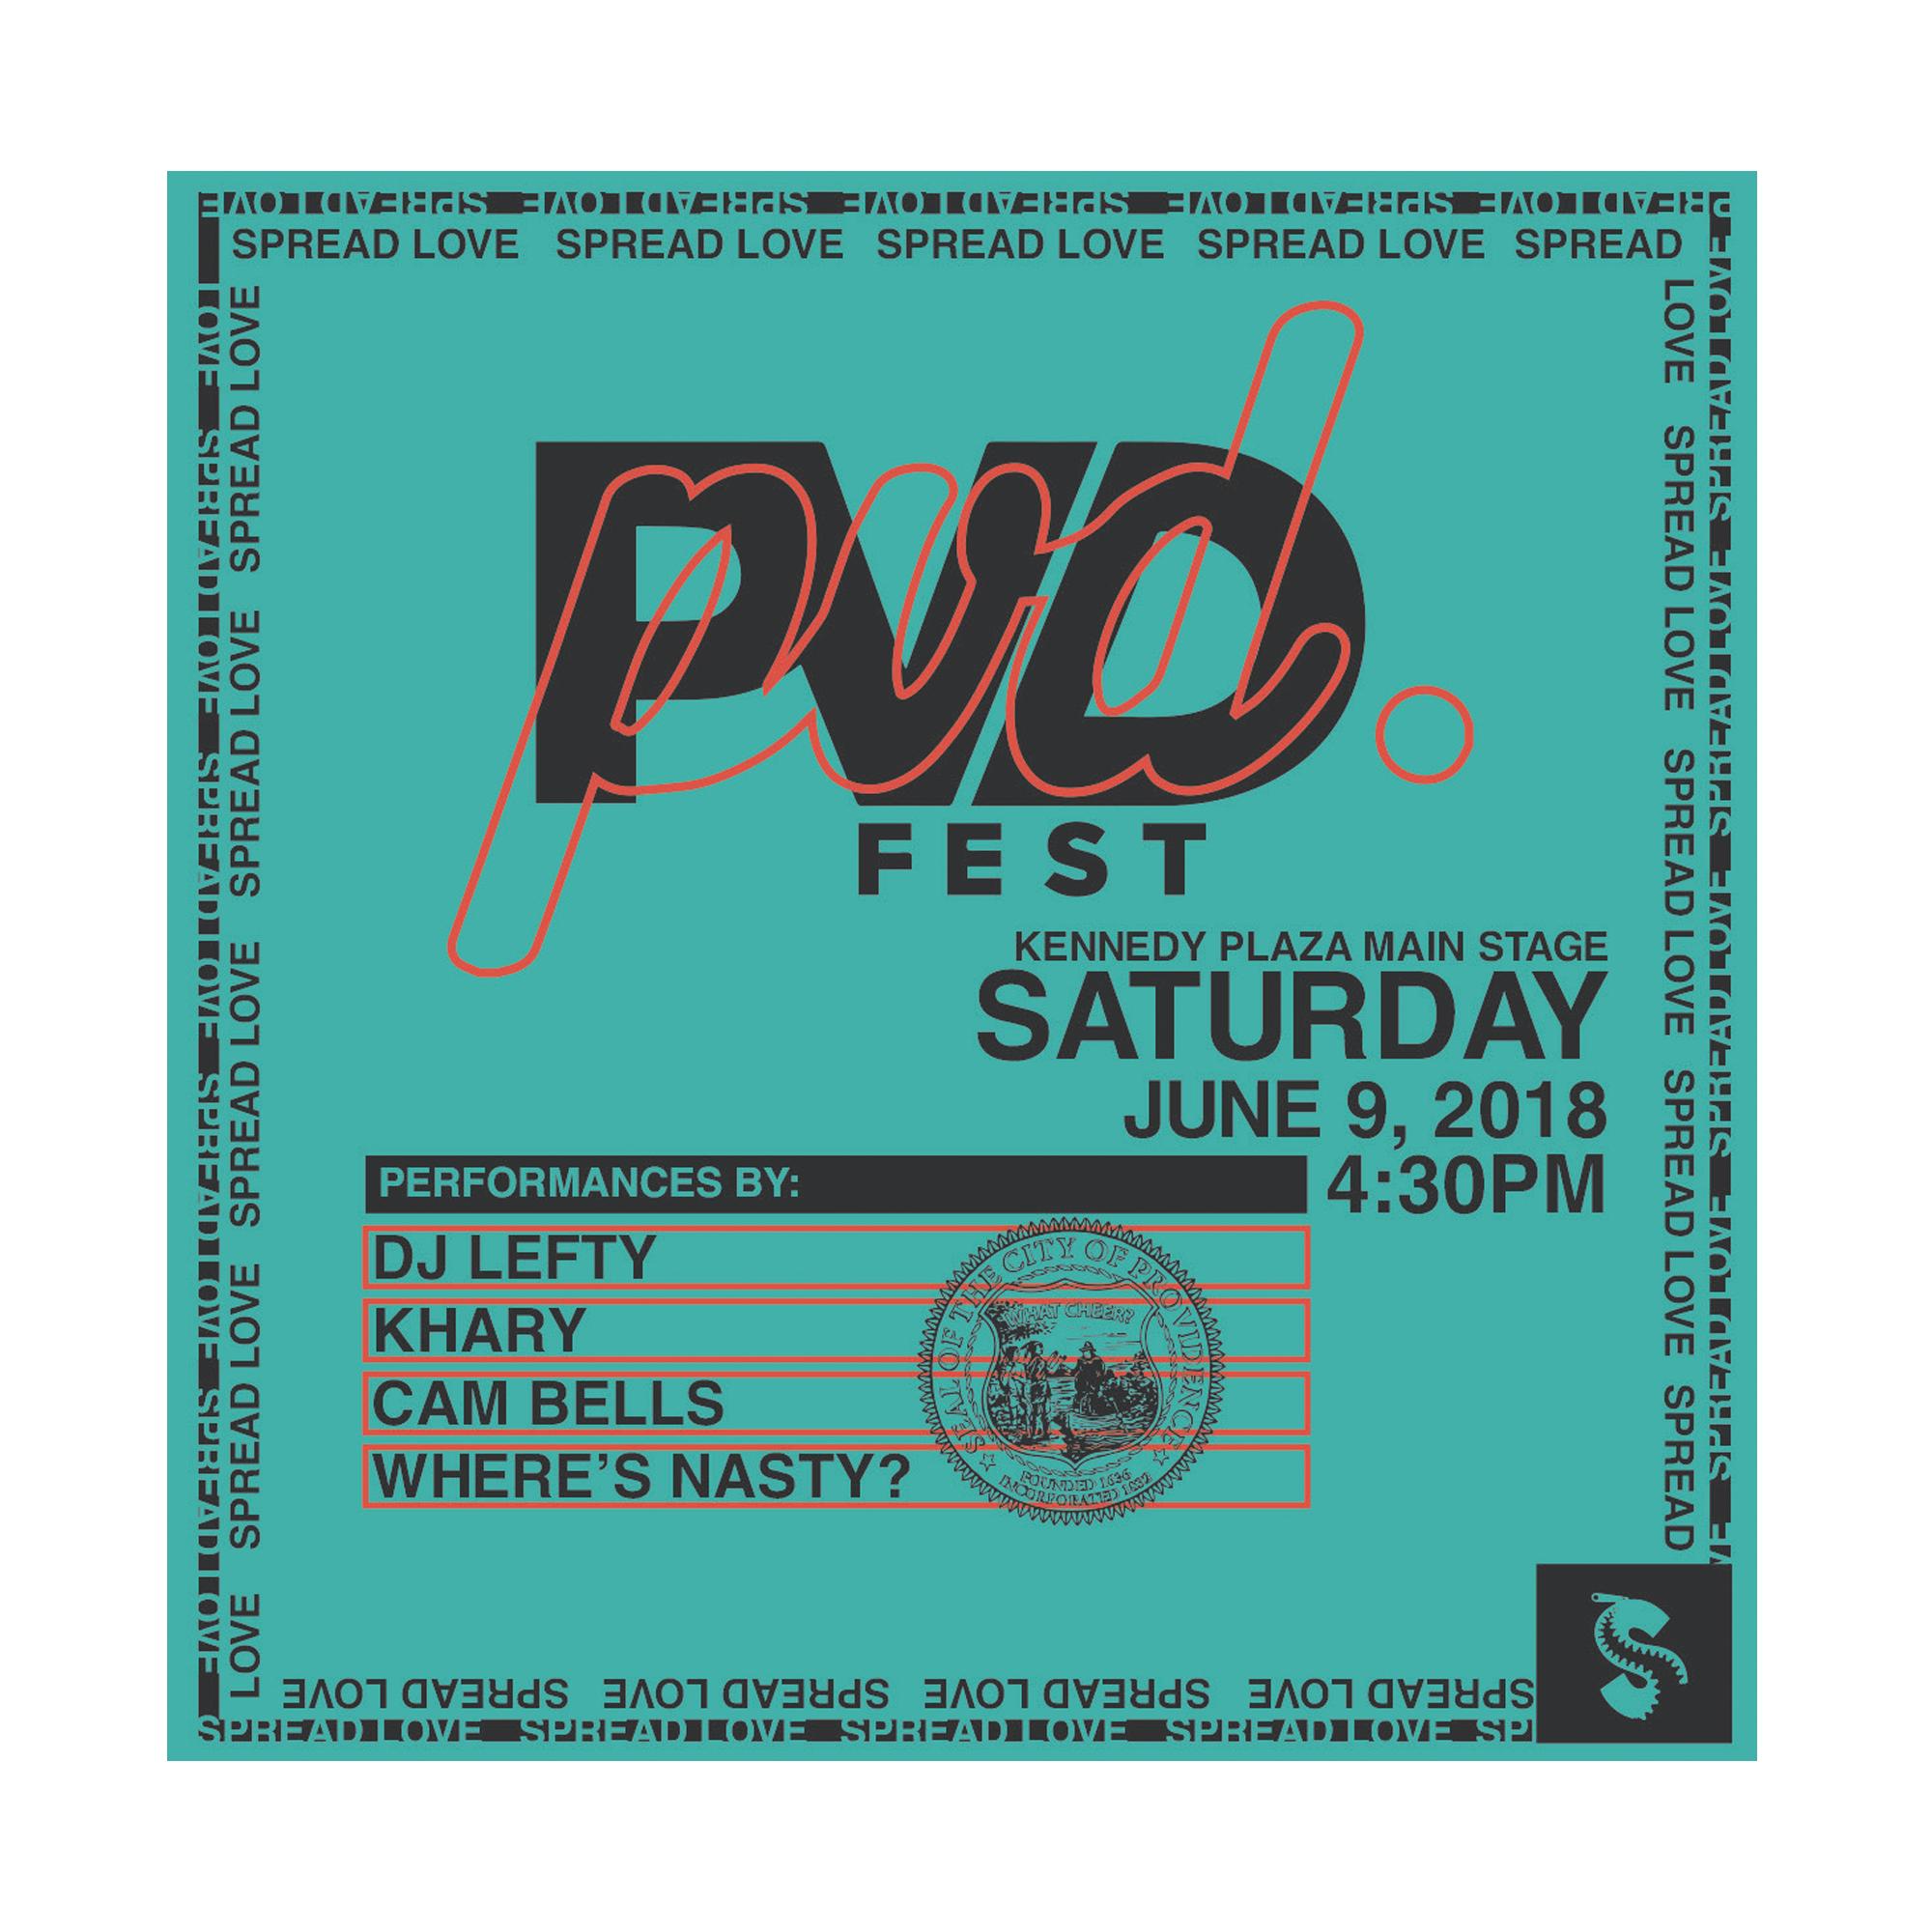 pvdfest-event.png